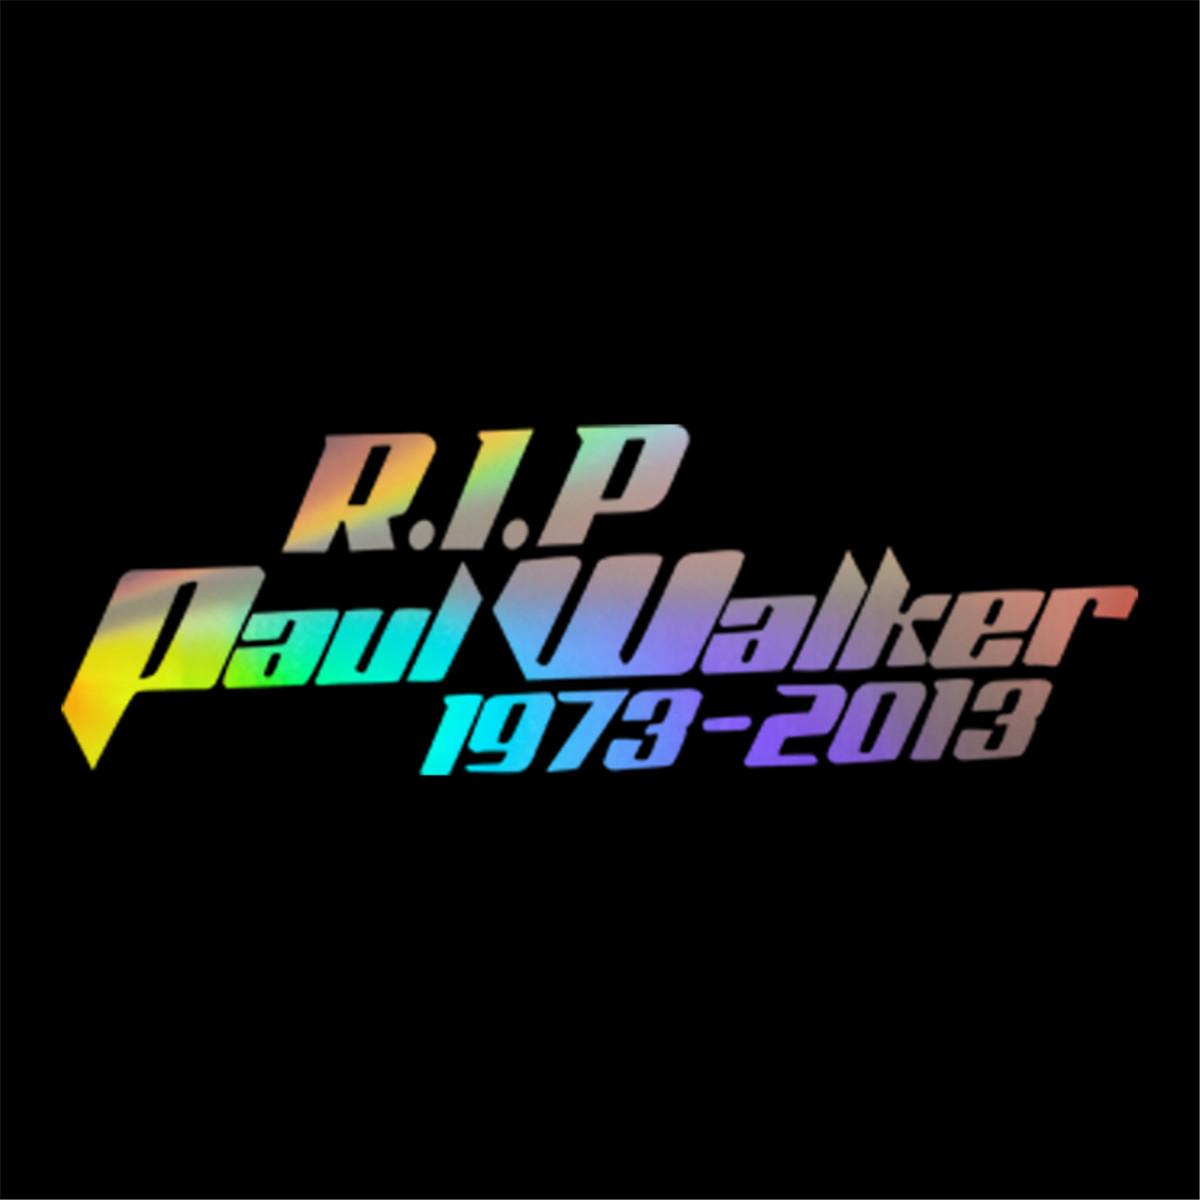 Rip Paul Walker Car Decal Window Door Laptop Bumper Auto Vinyl Sticker Decor